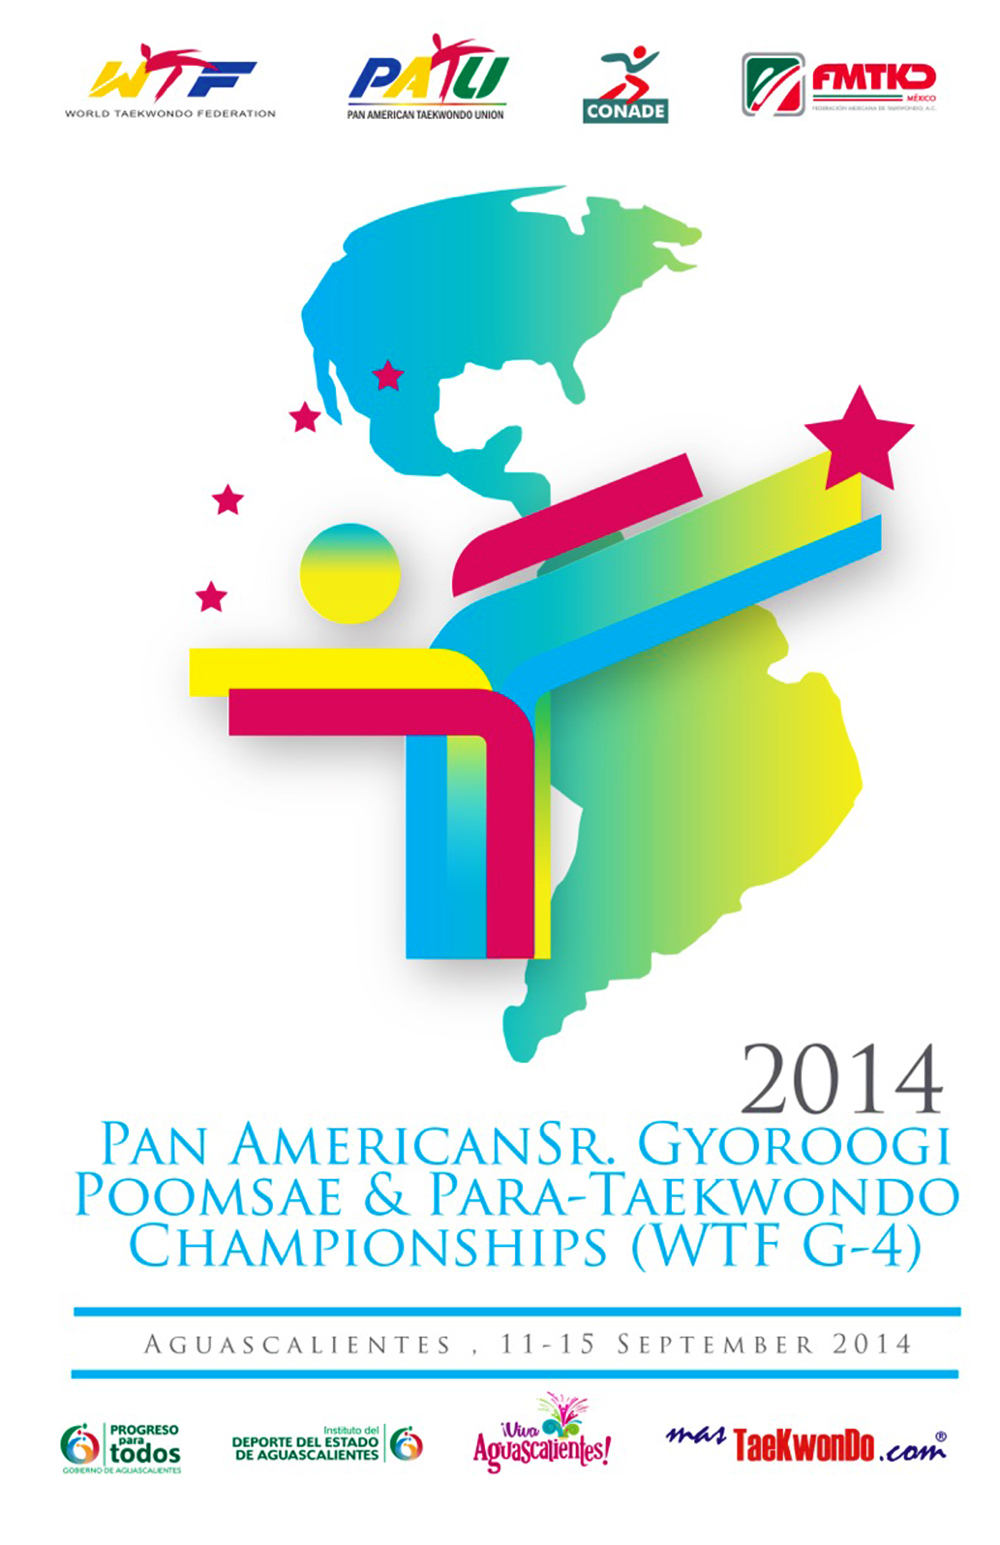 2014-04-12_84538x_Cartel-Panamericano-2014-10_